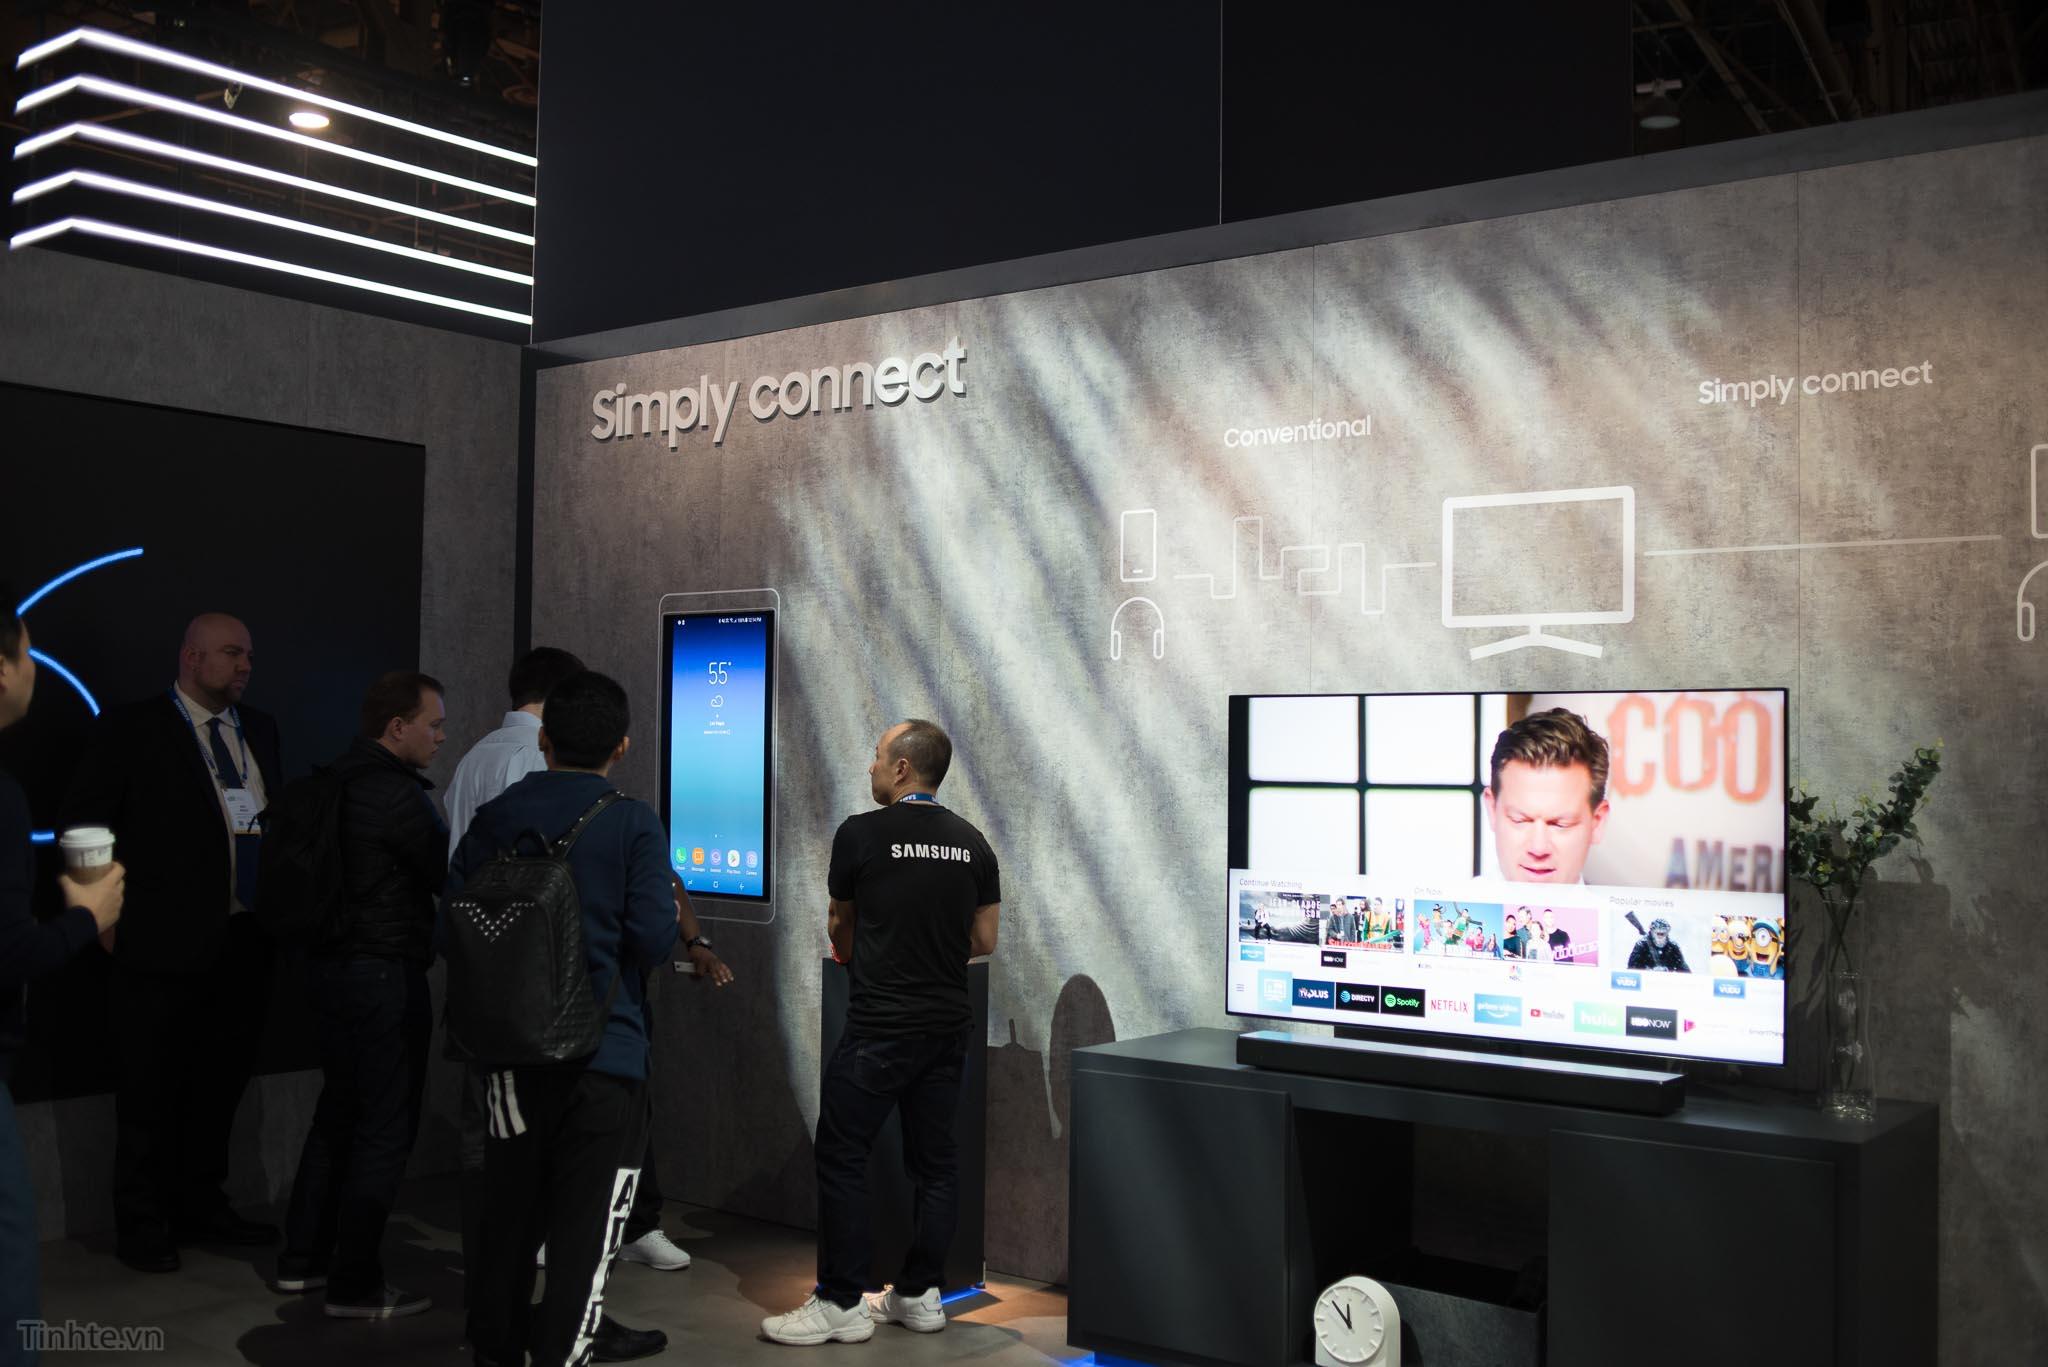 Samsung_TV_Tinhte.vn_CES_2018-4.jpg